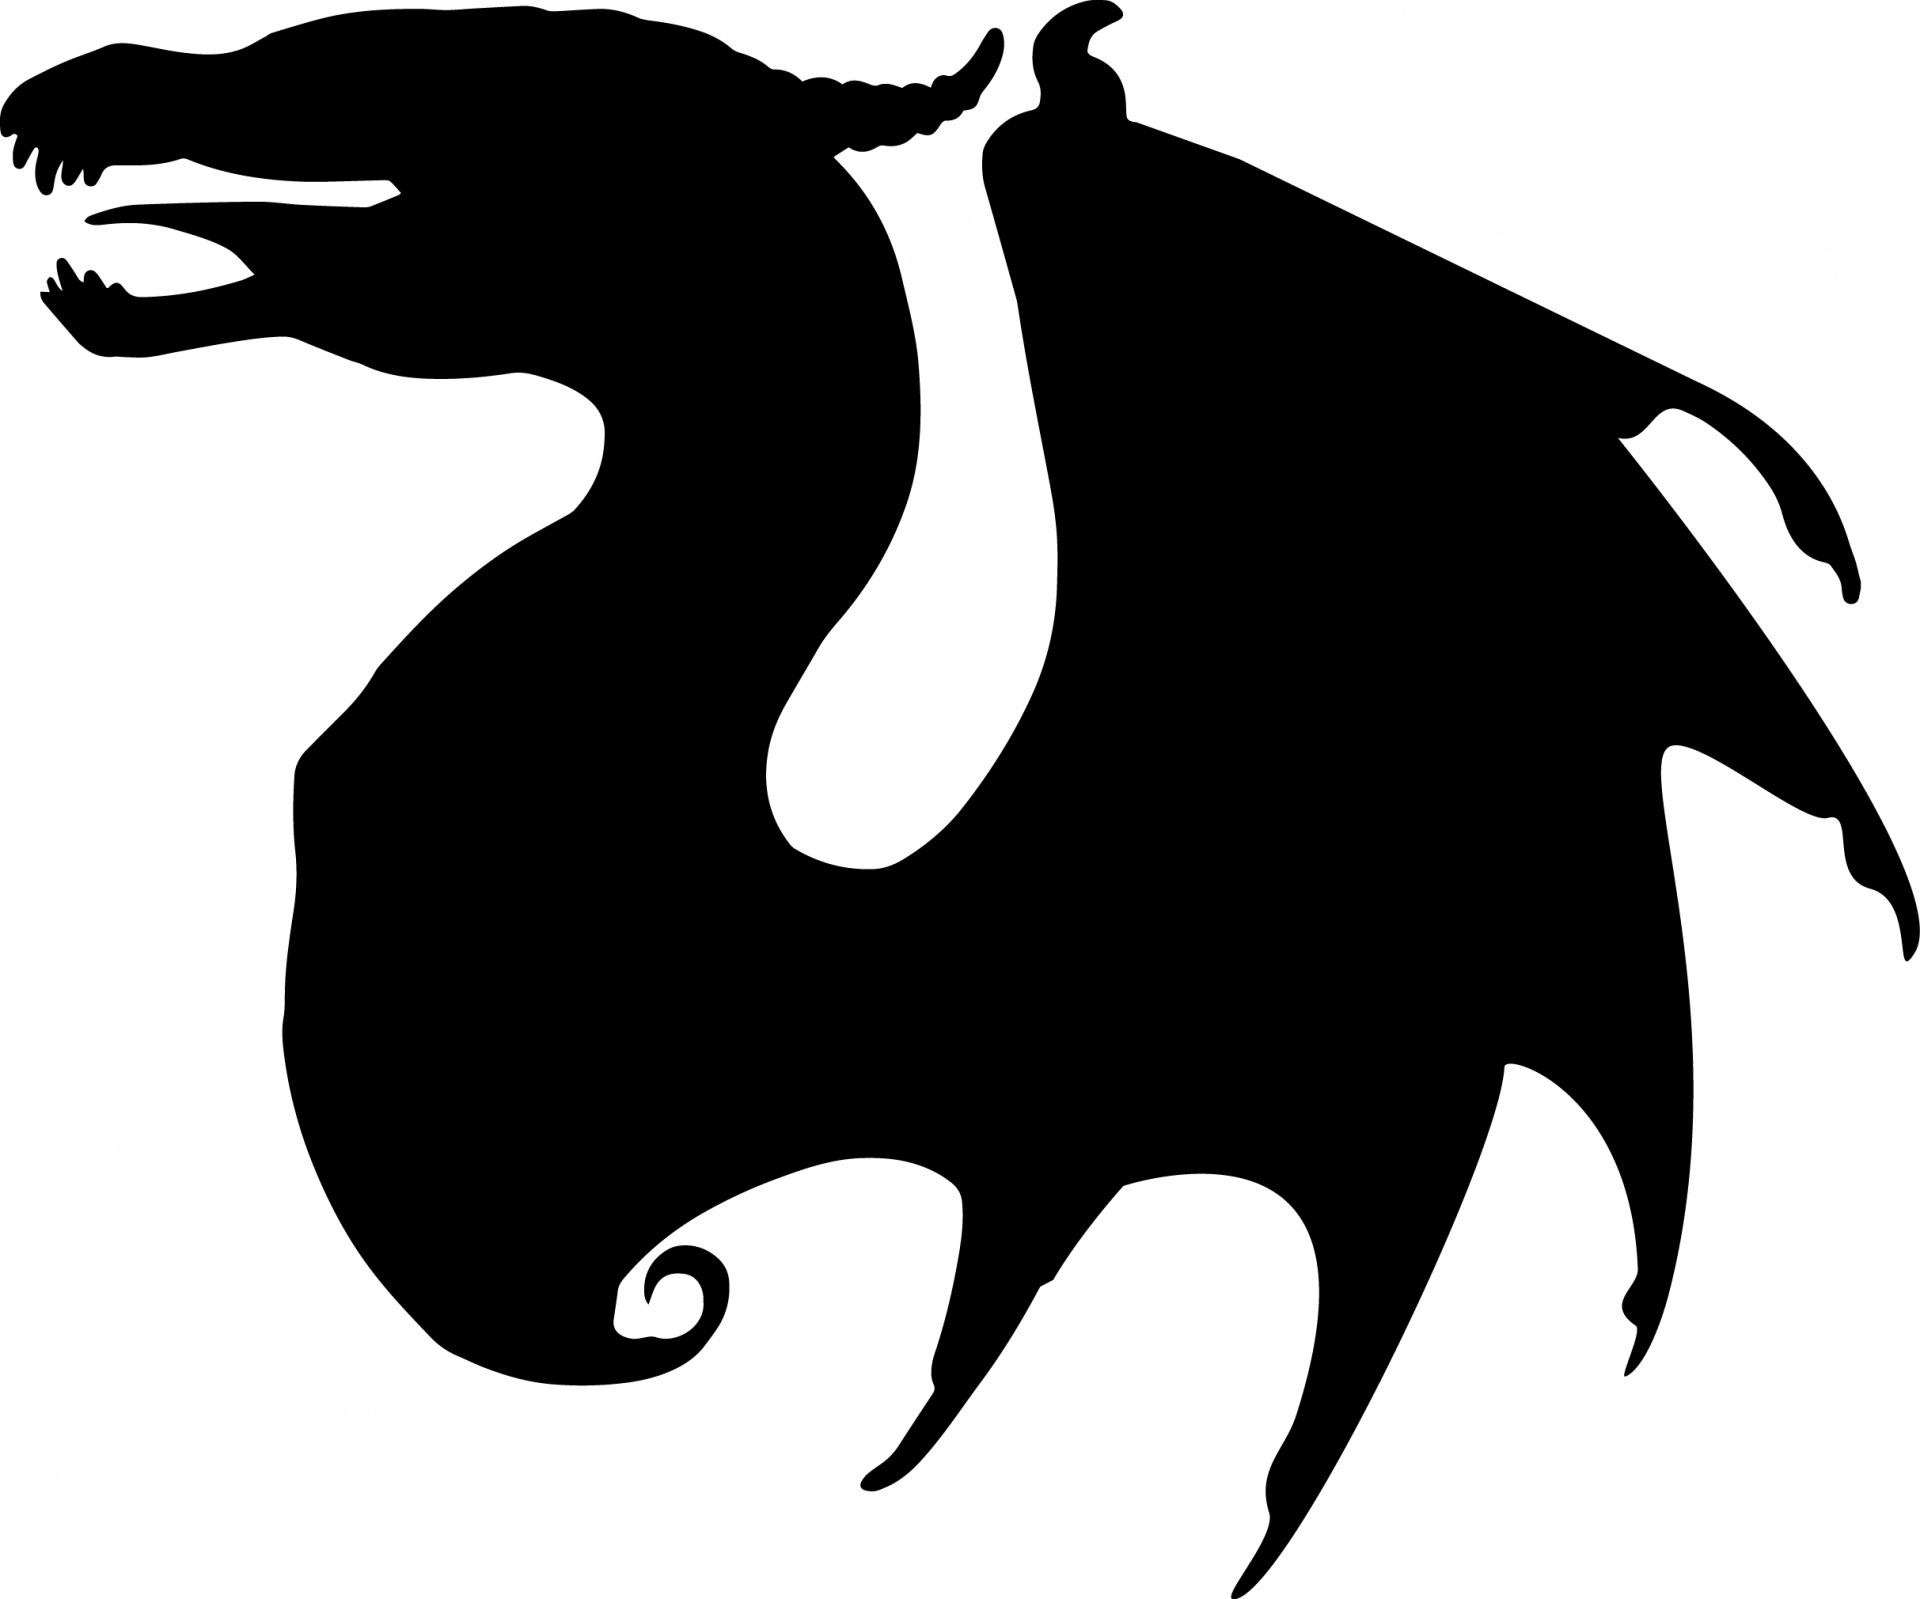 1920x1599 Dragon Silhouette Drawing Free Stock Photo